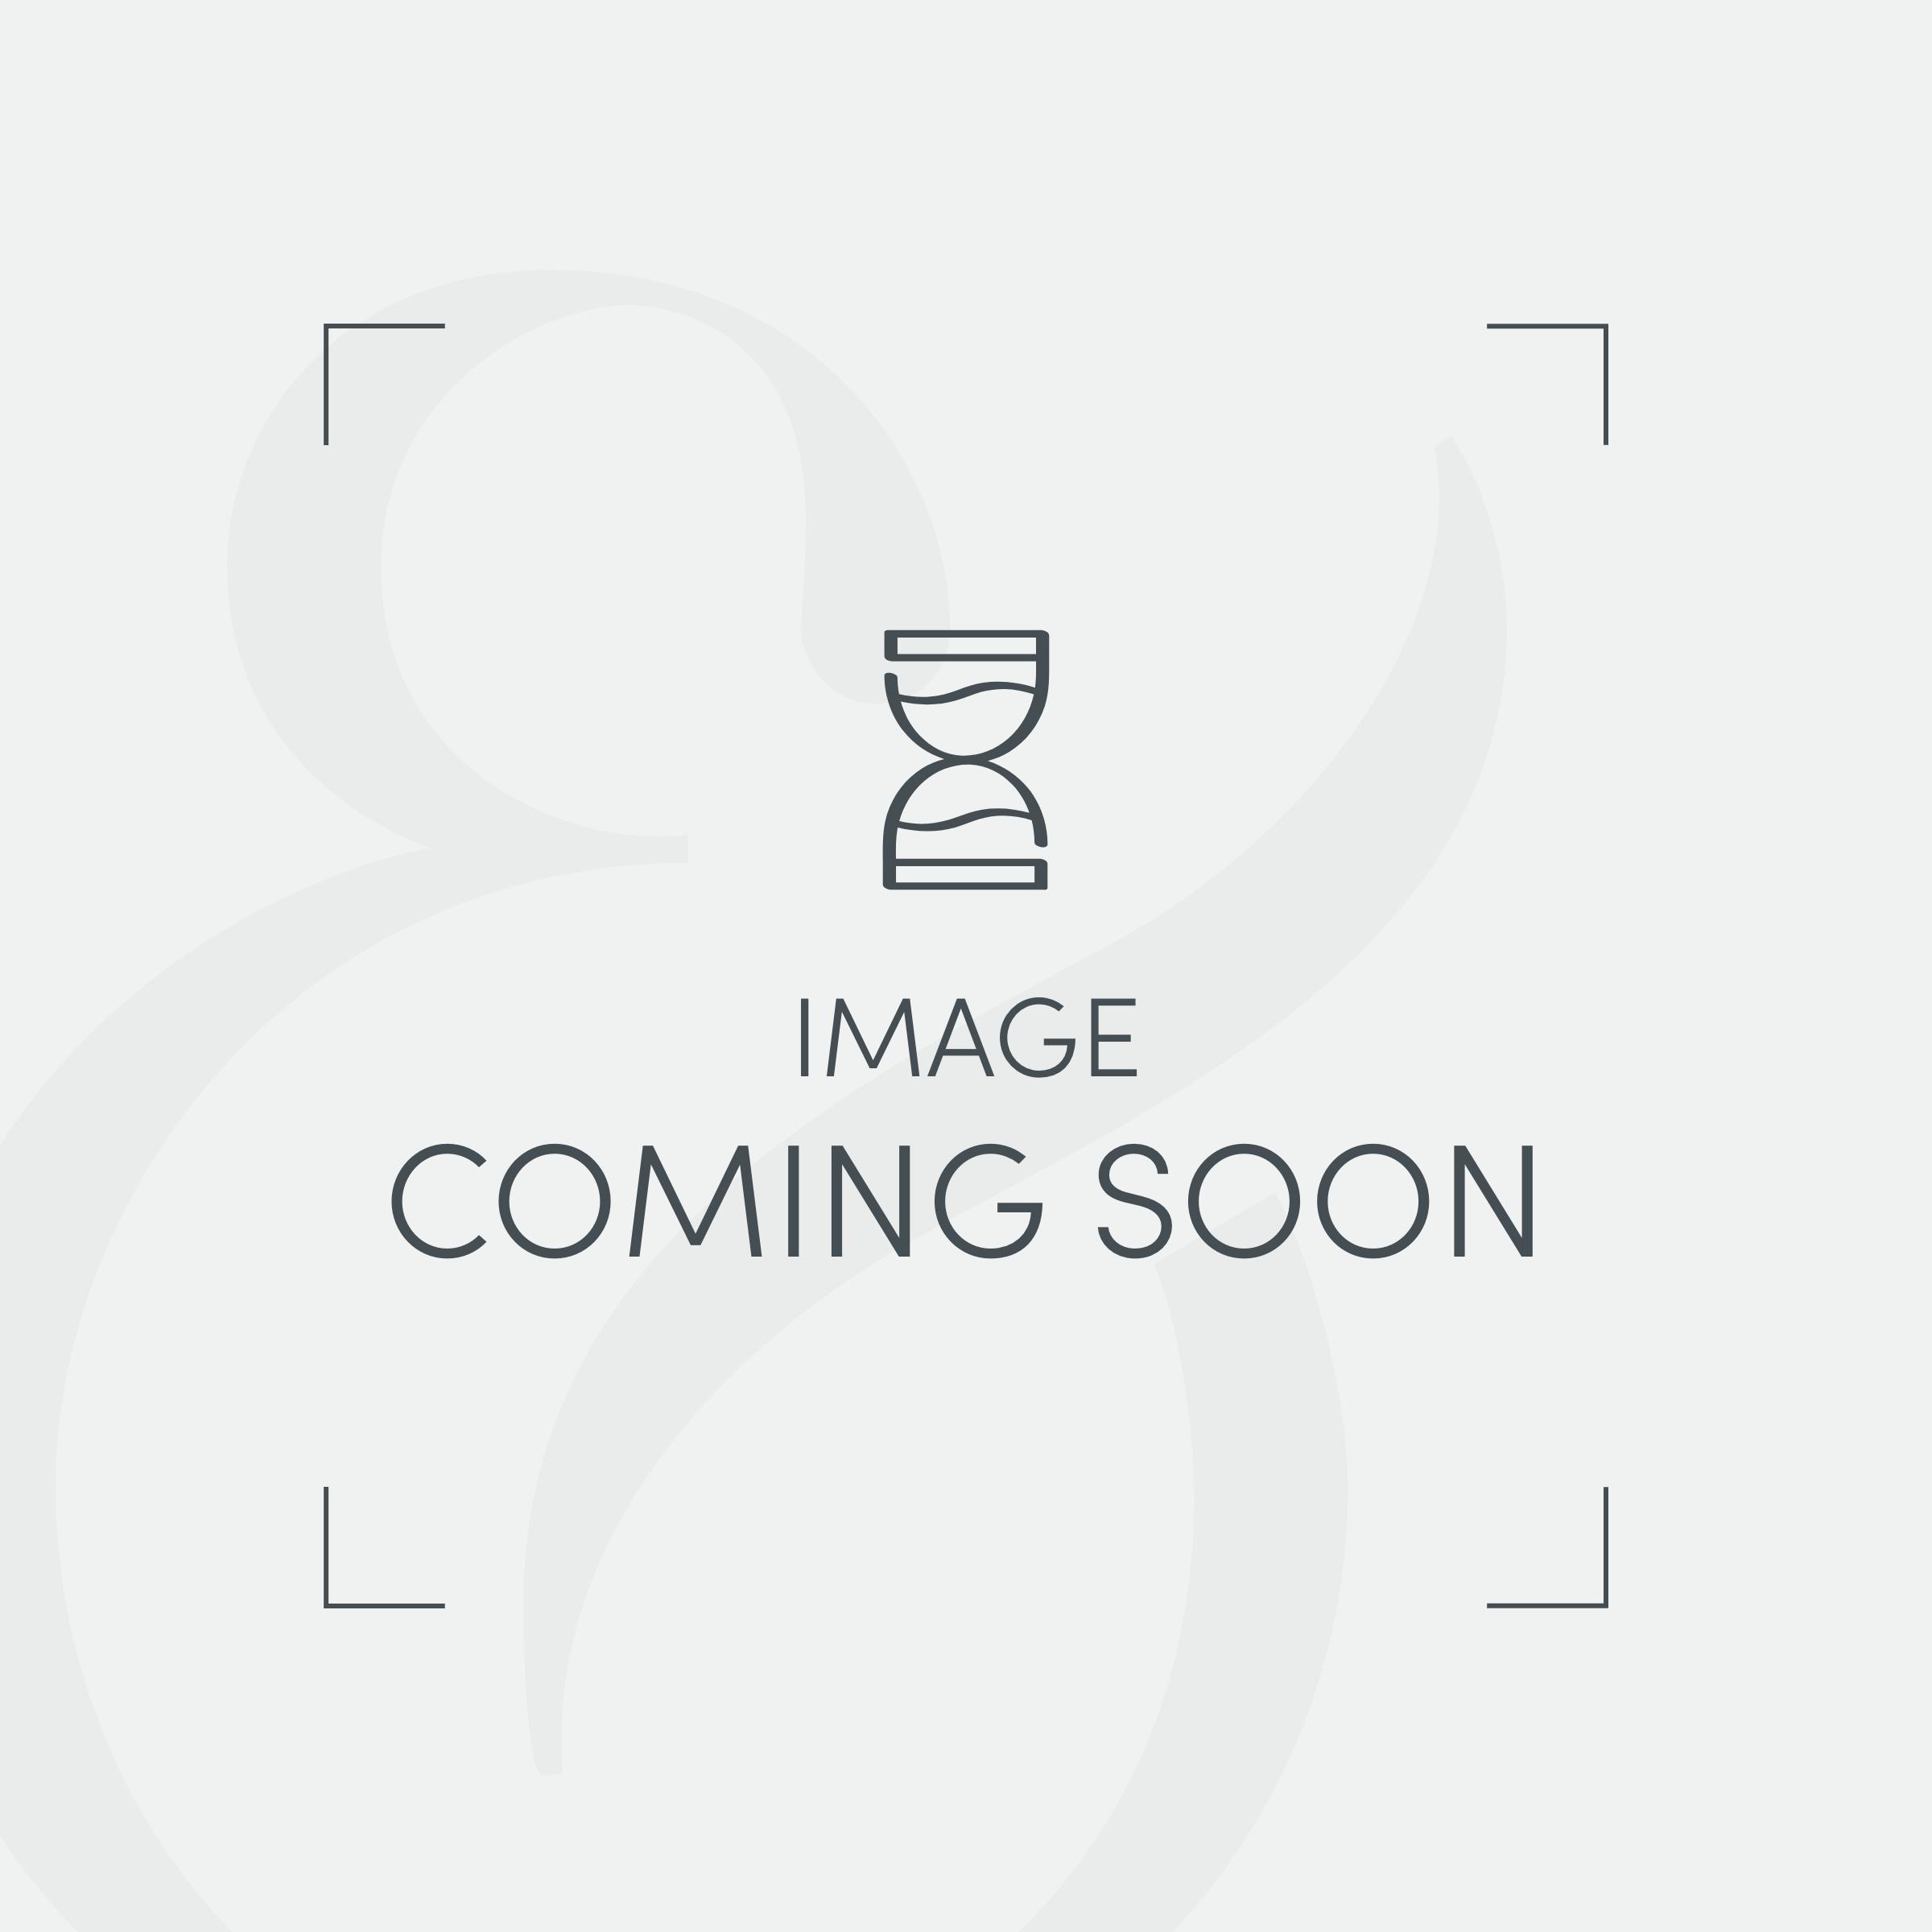 Egyptian Towel Set (2 x Hand Towels, 2 x Bath Towels) - Light Blue